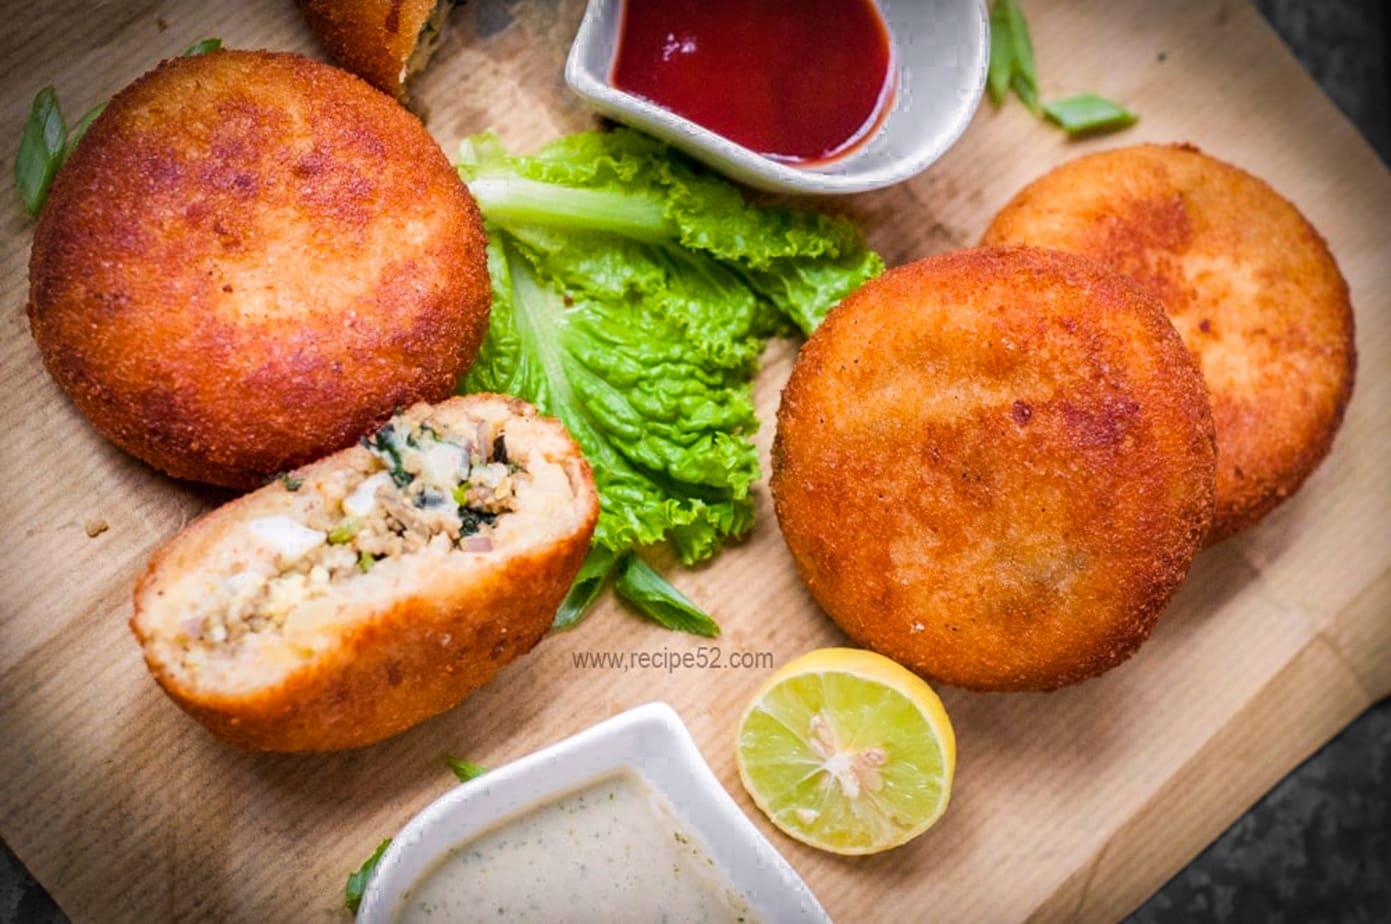 Mutton patties recipe